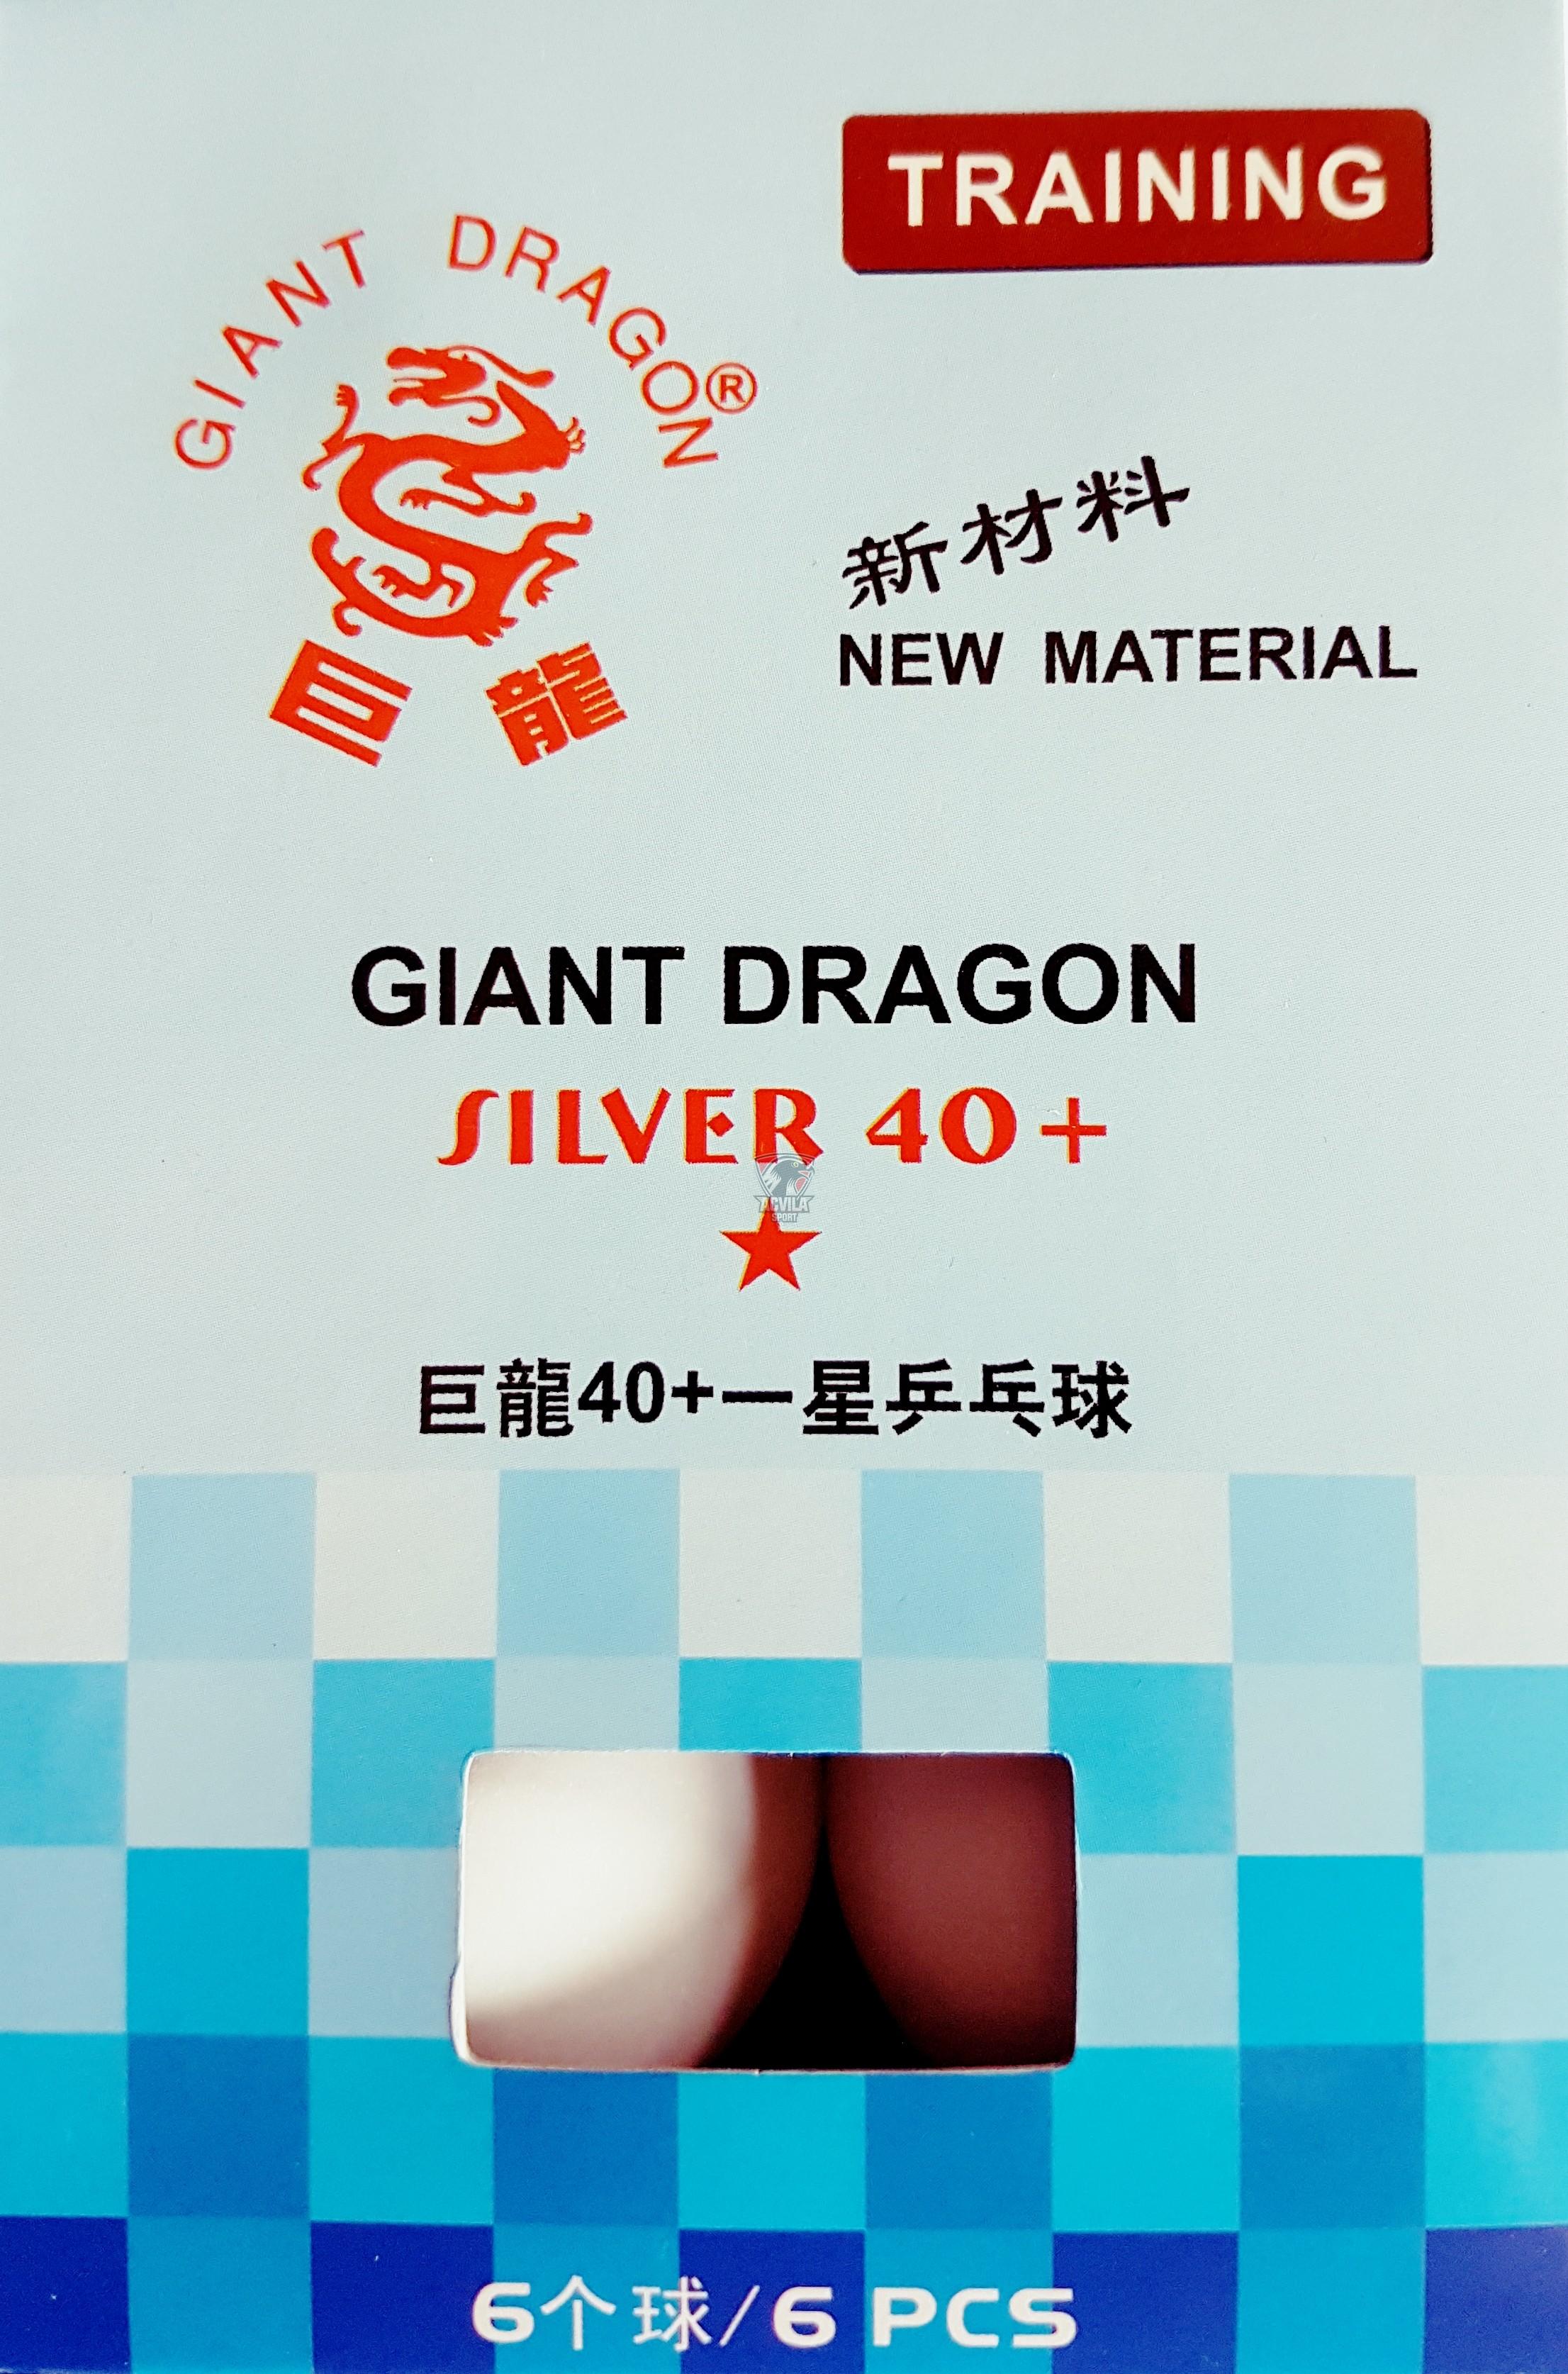 photo 0 Minge tenis masă Giant Dragon Silver 40+ 1 stea